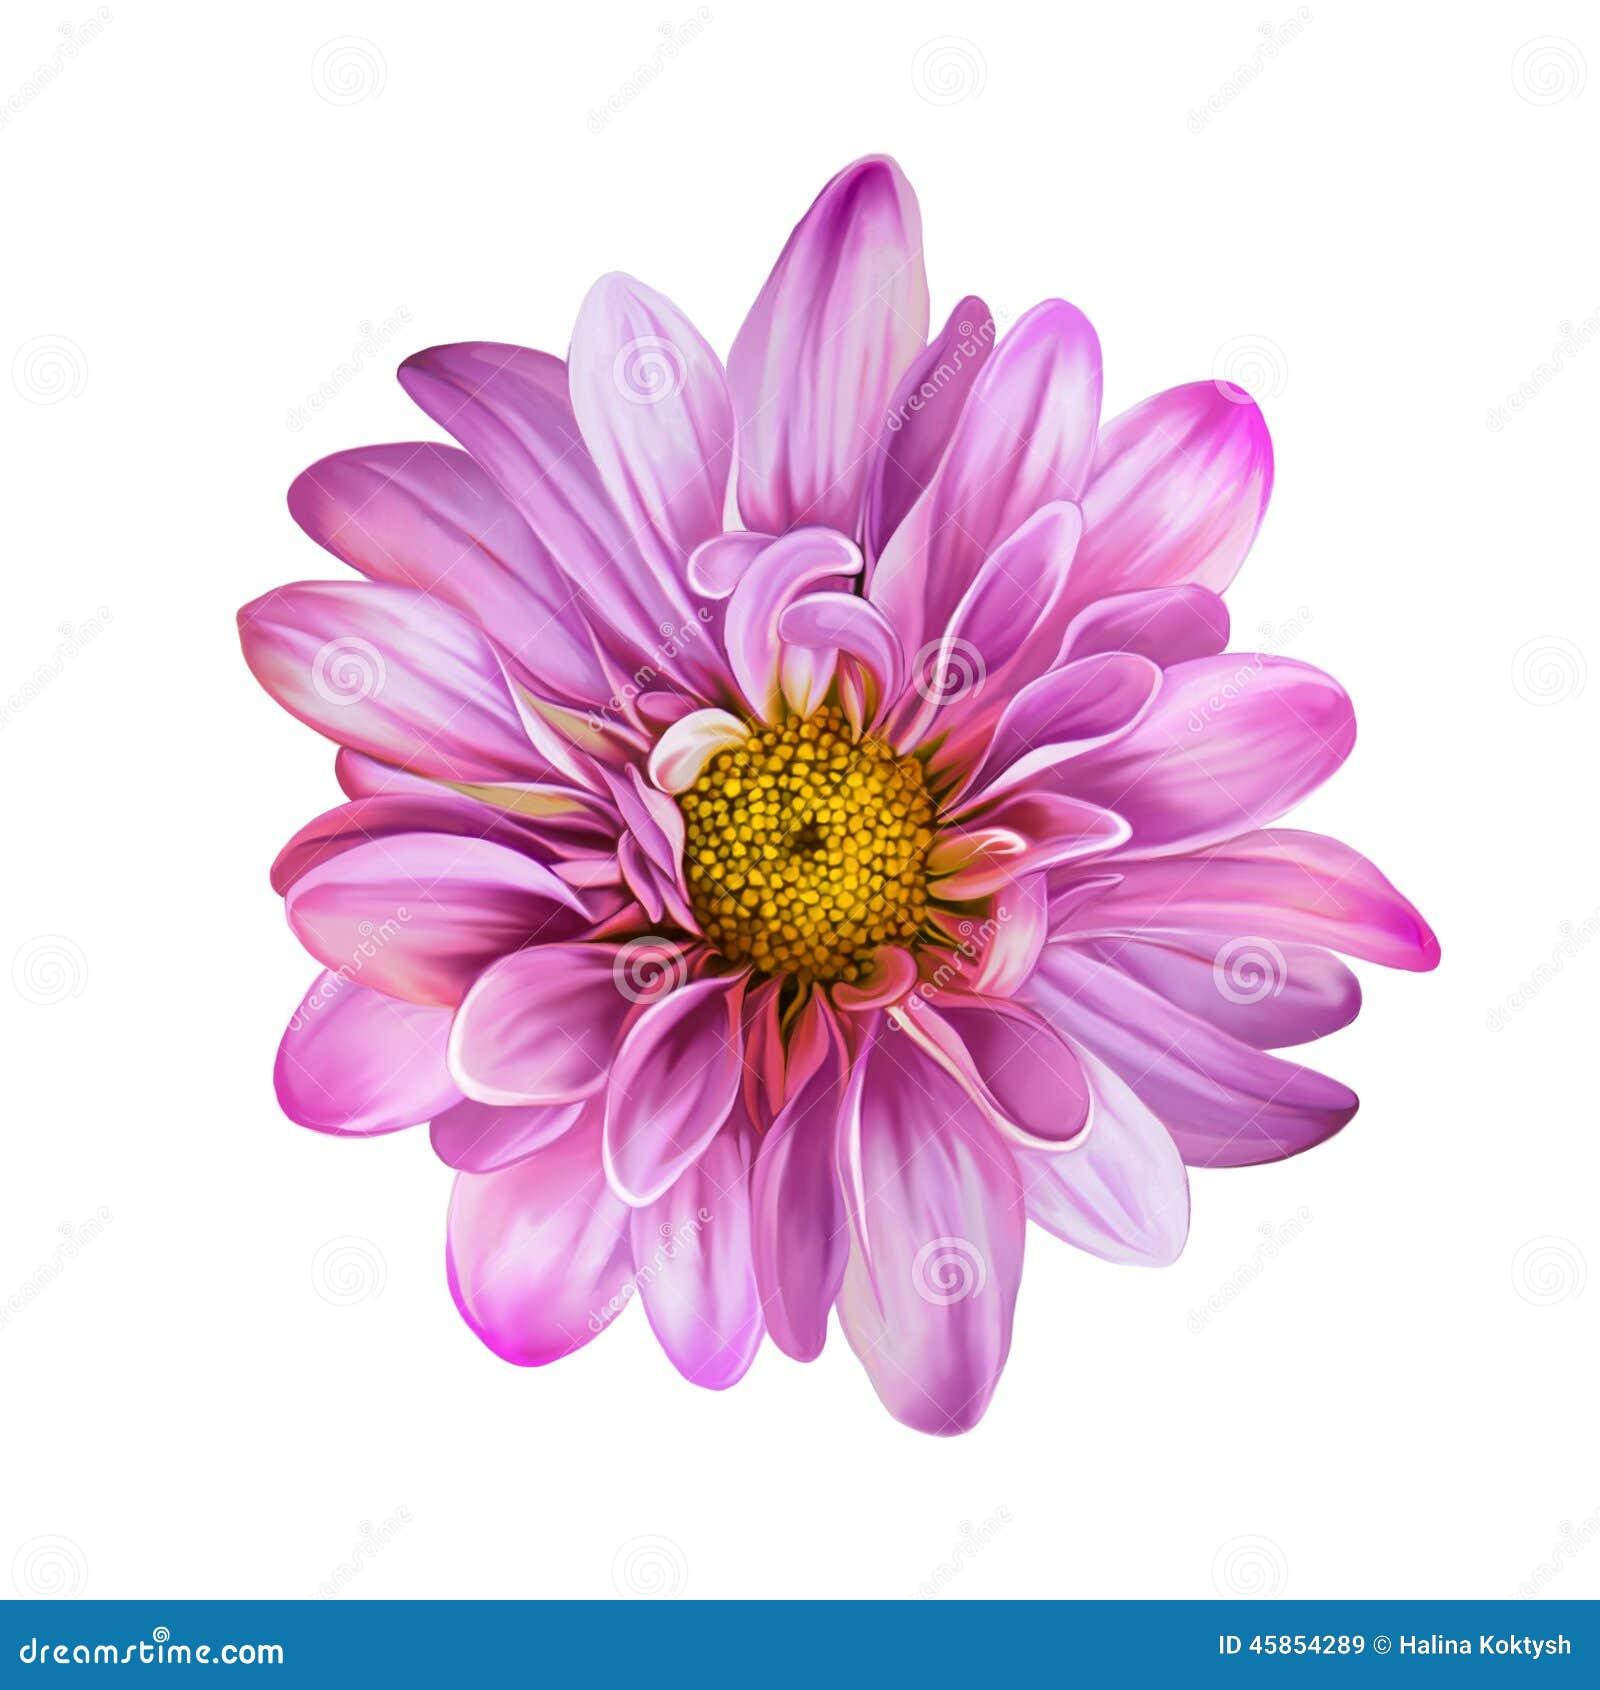 rosa mona lisa blume blume stock abbildung illustration von chrysantheme blume 45854289. Black Bedroom Furniture Sets. Home Design Ideas